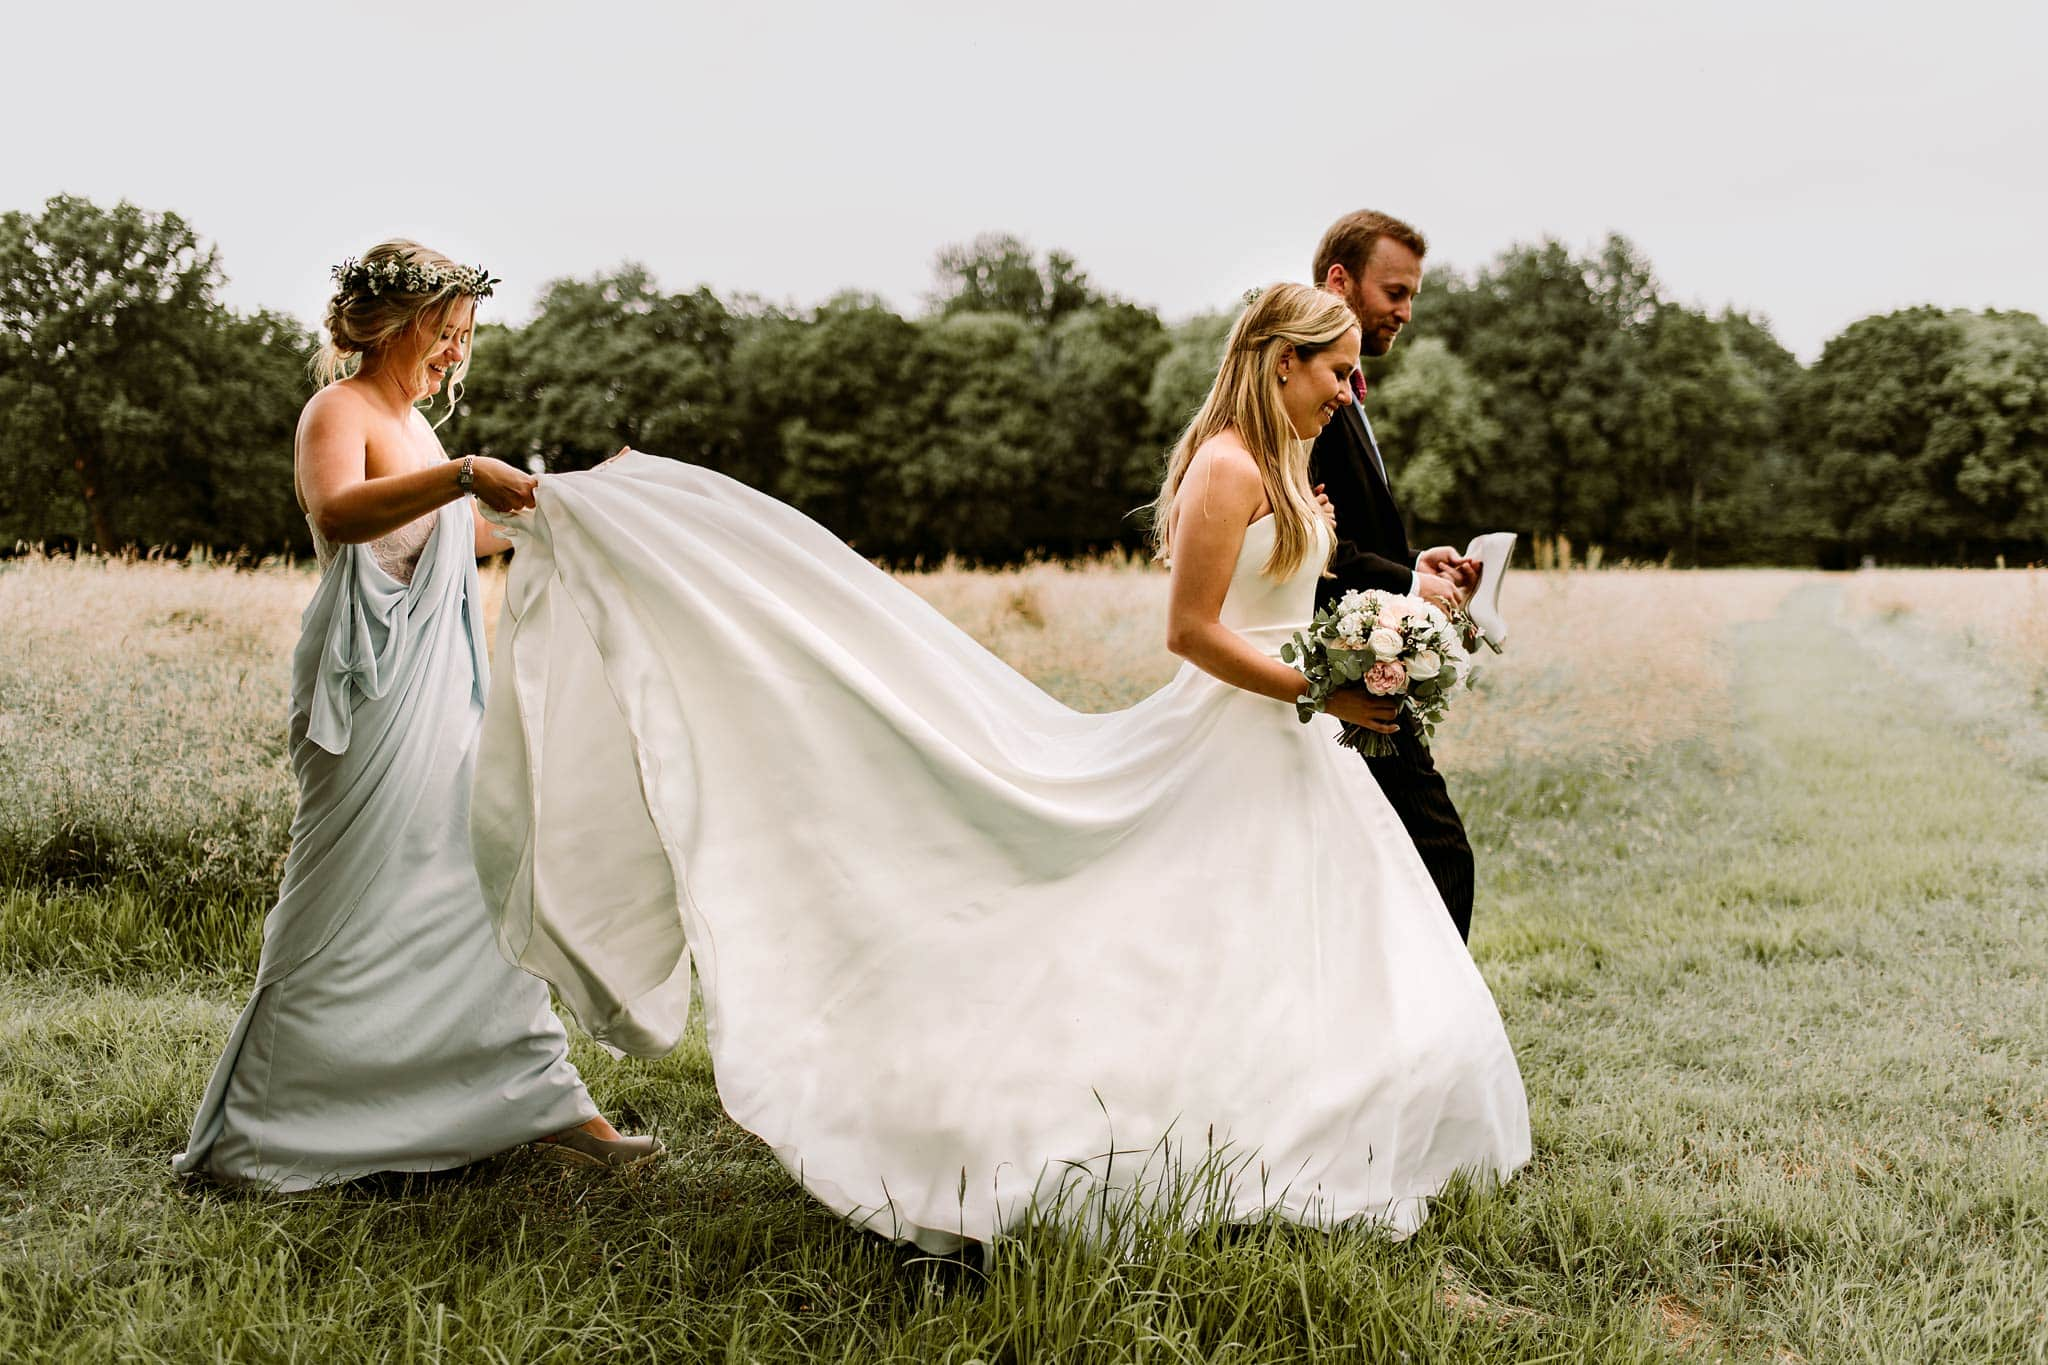 Amber de Savary Rural Summer Wedding